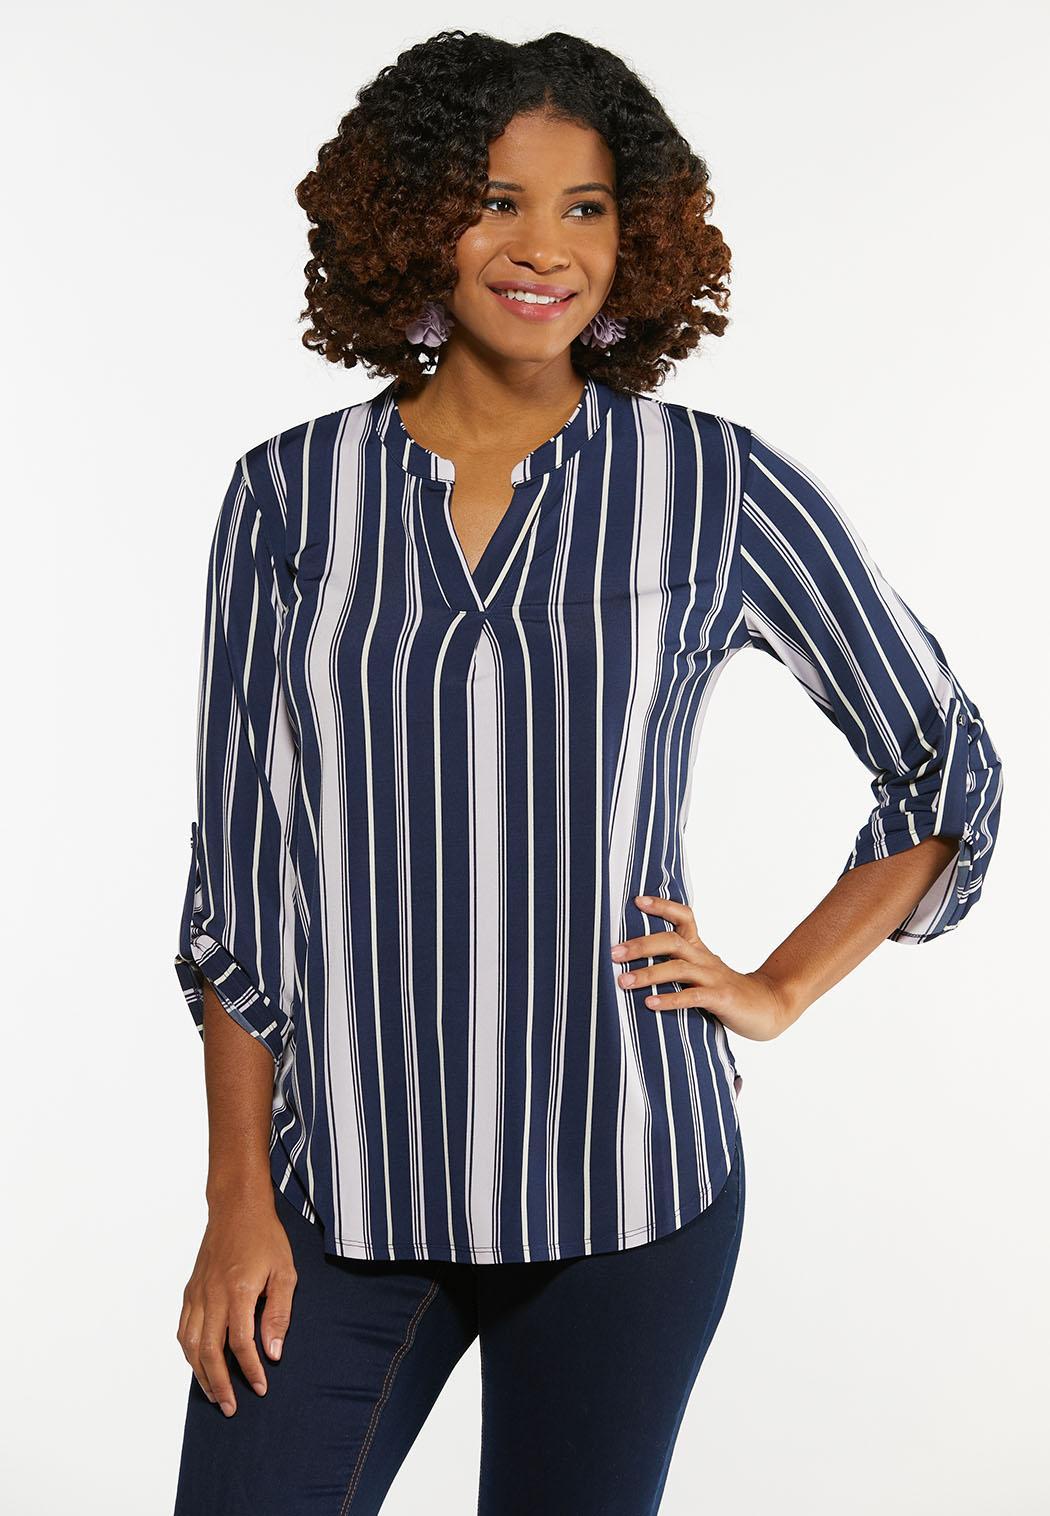 Dressy Striped Top